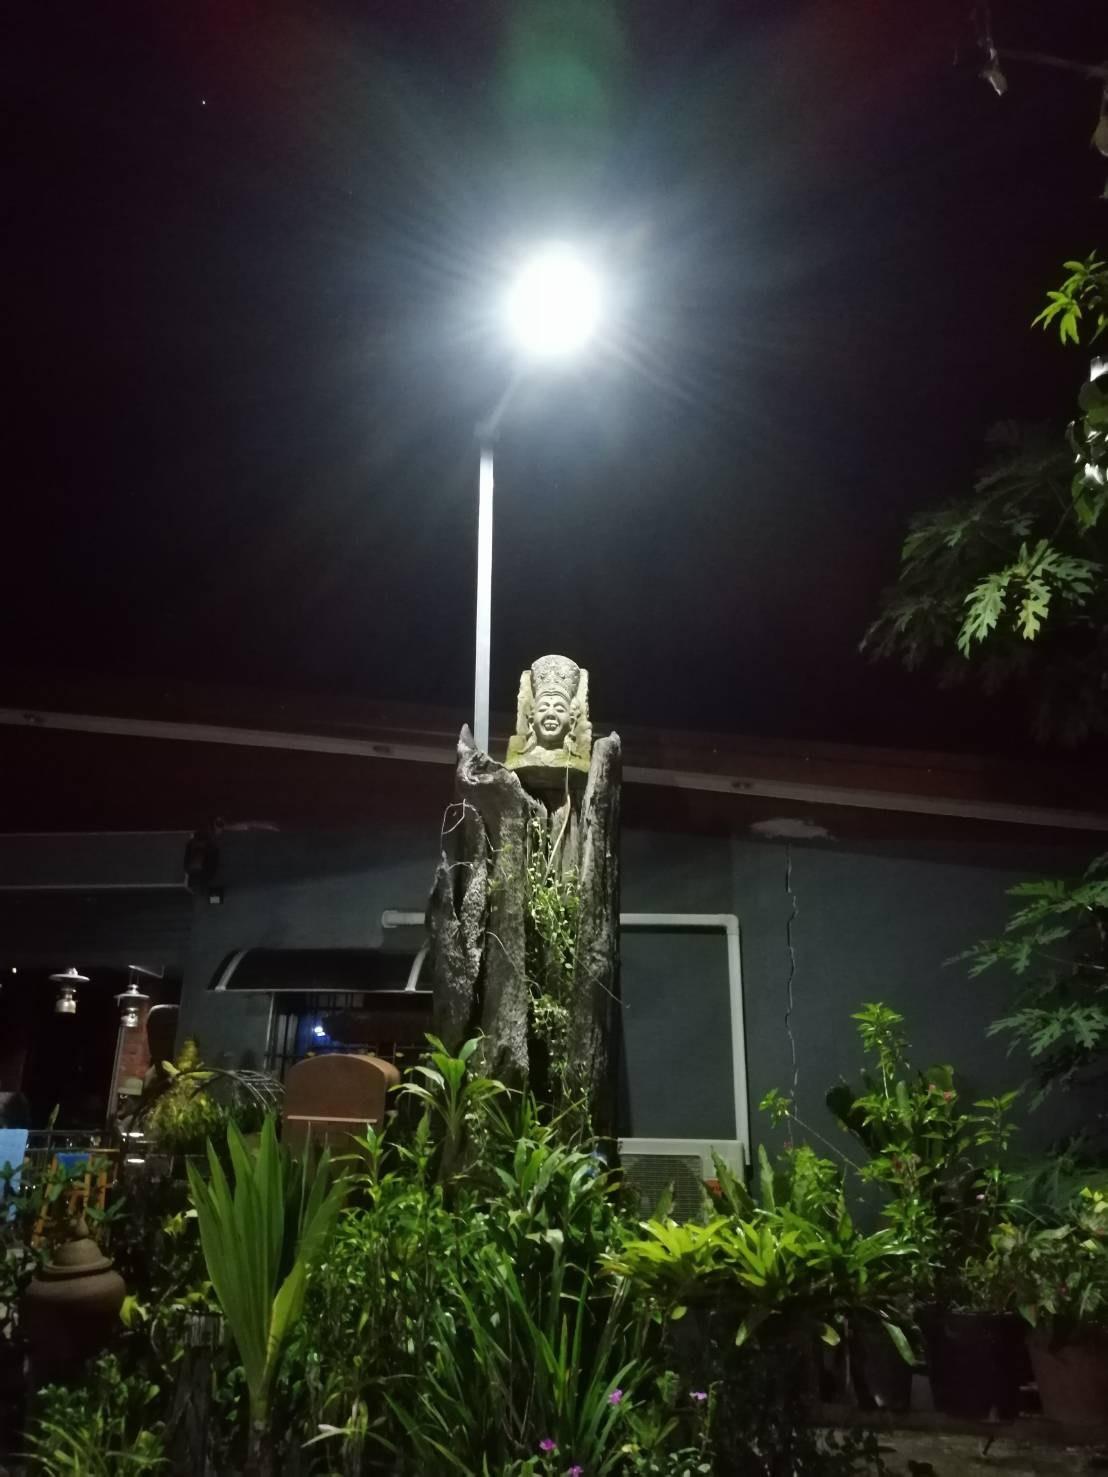 ALLTOP -Alltop Manufacturer Outdoor Solar Led Street Light With Price List-2